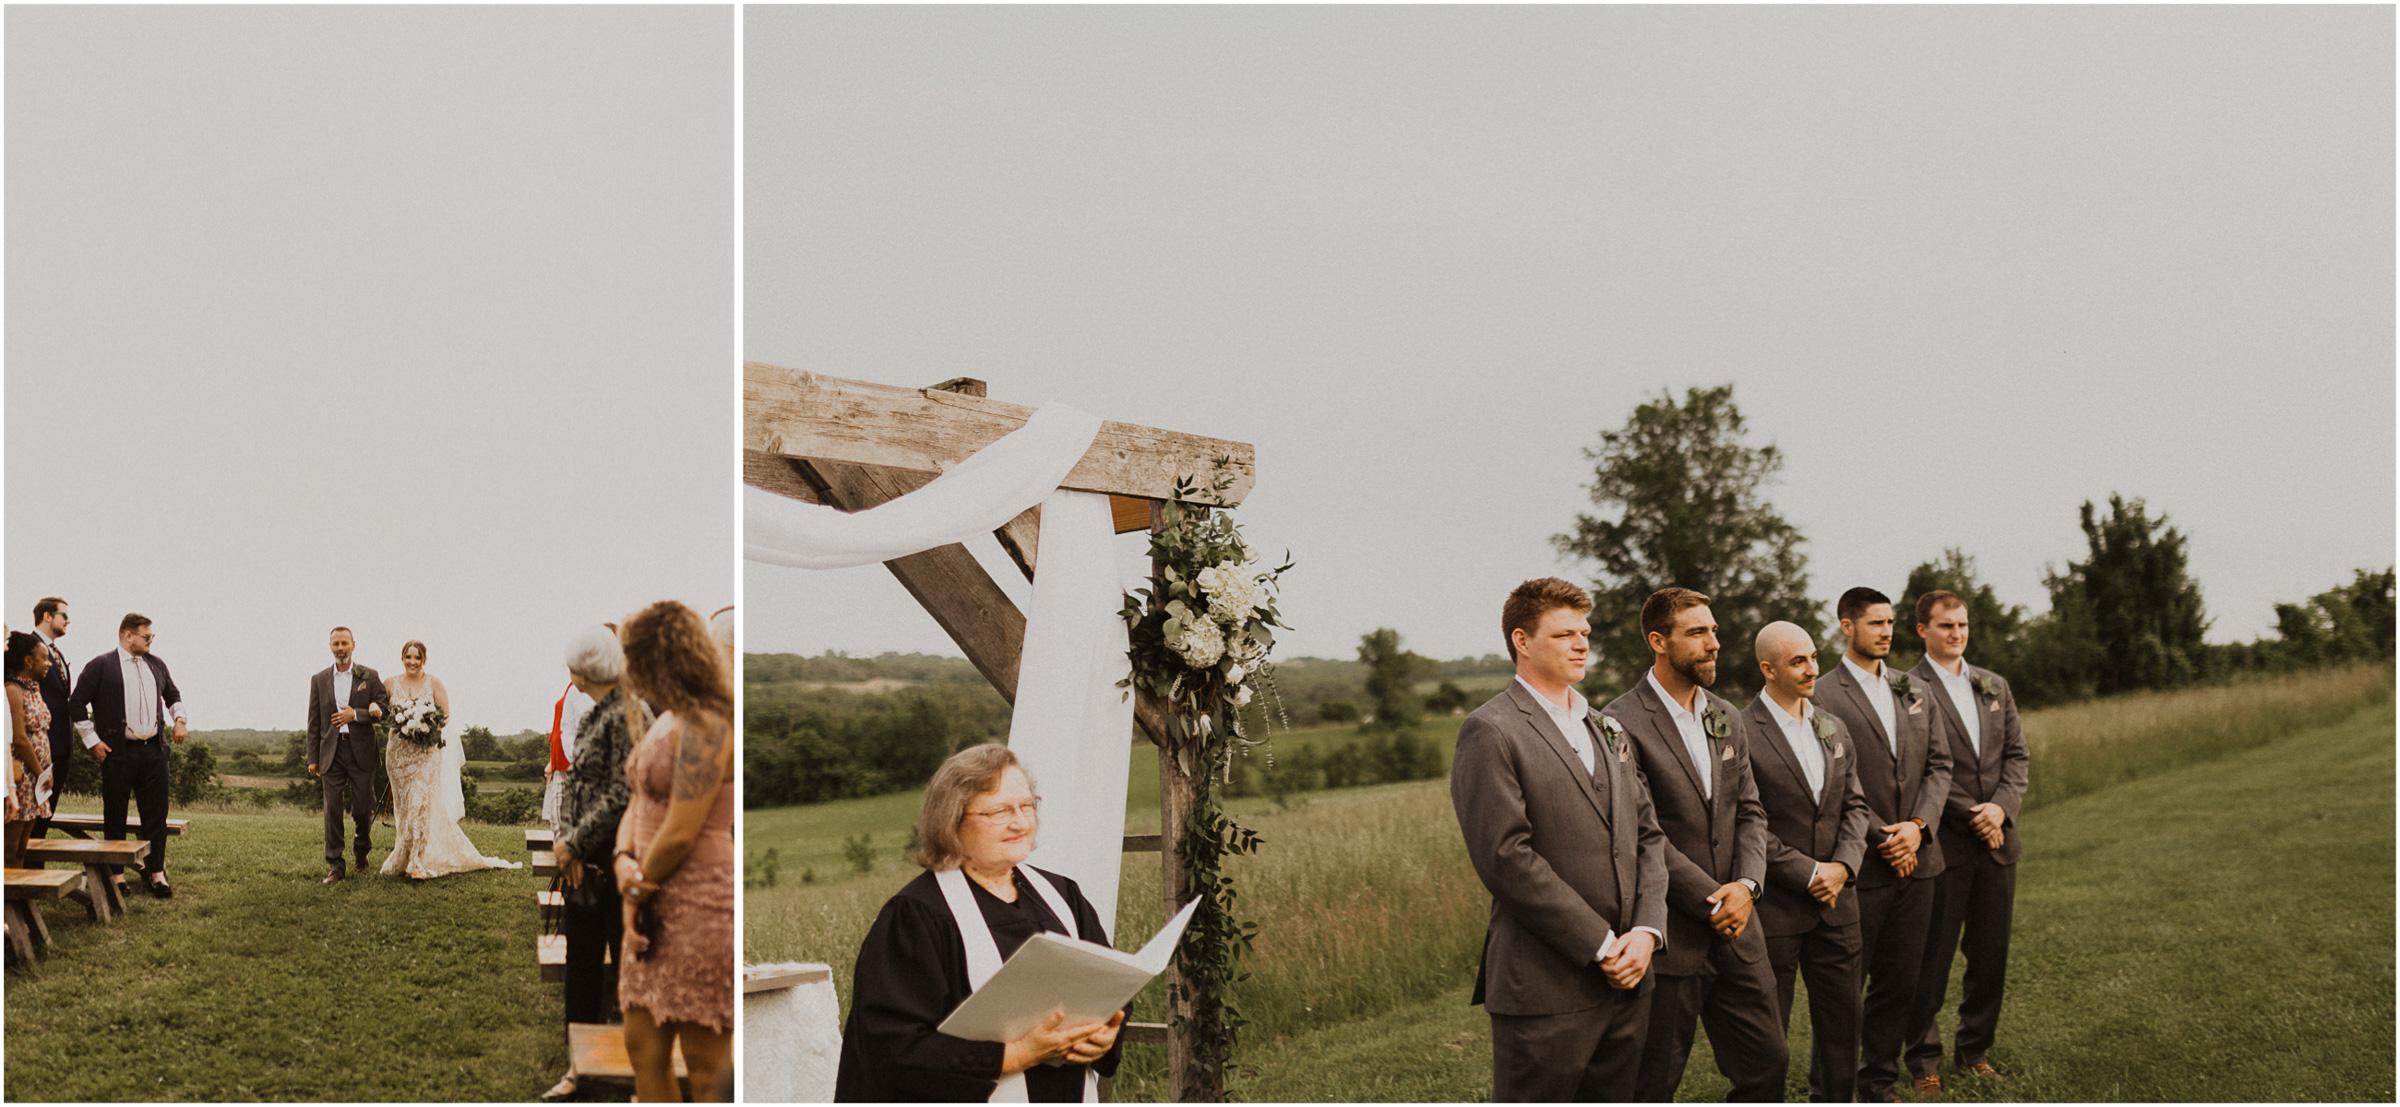 alyssa barletter photography weston red barn farm timberbarn summer outdoor wedding-41.jpg